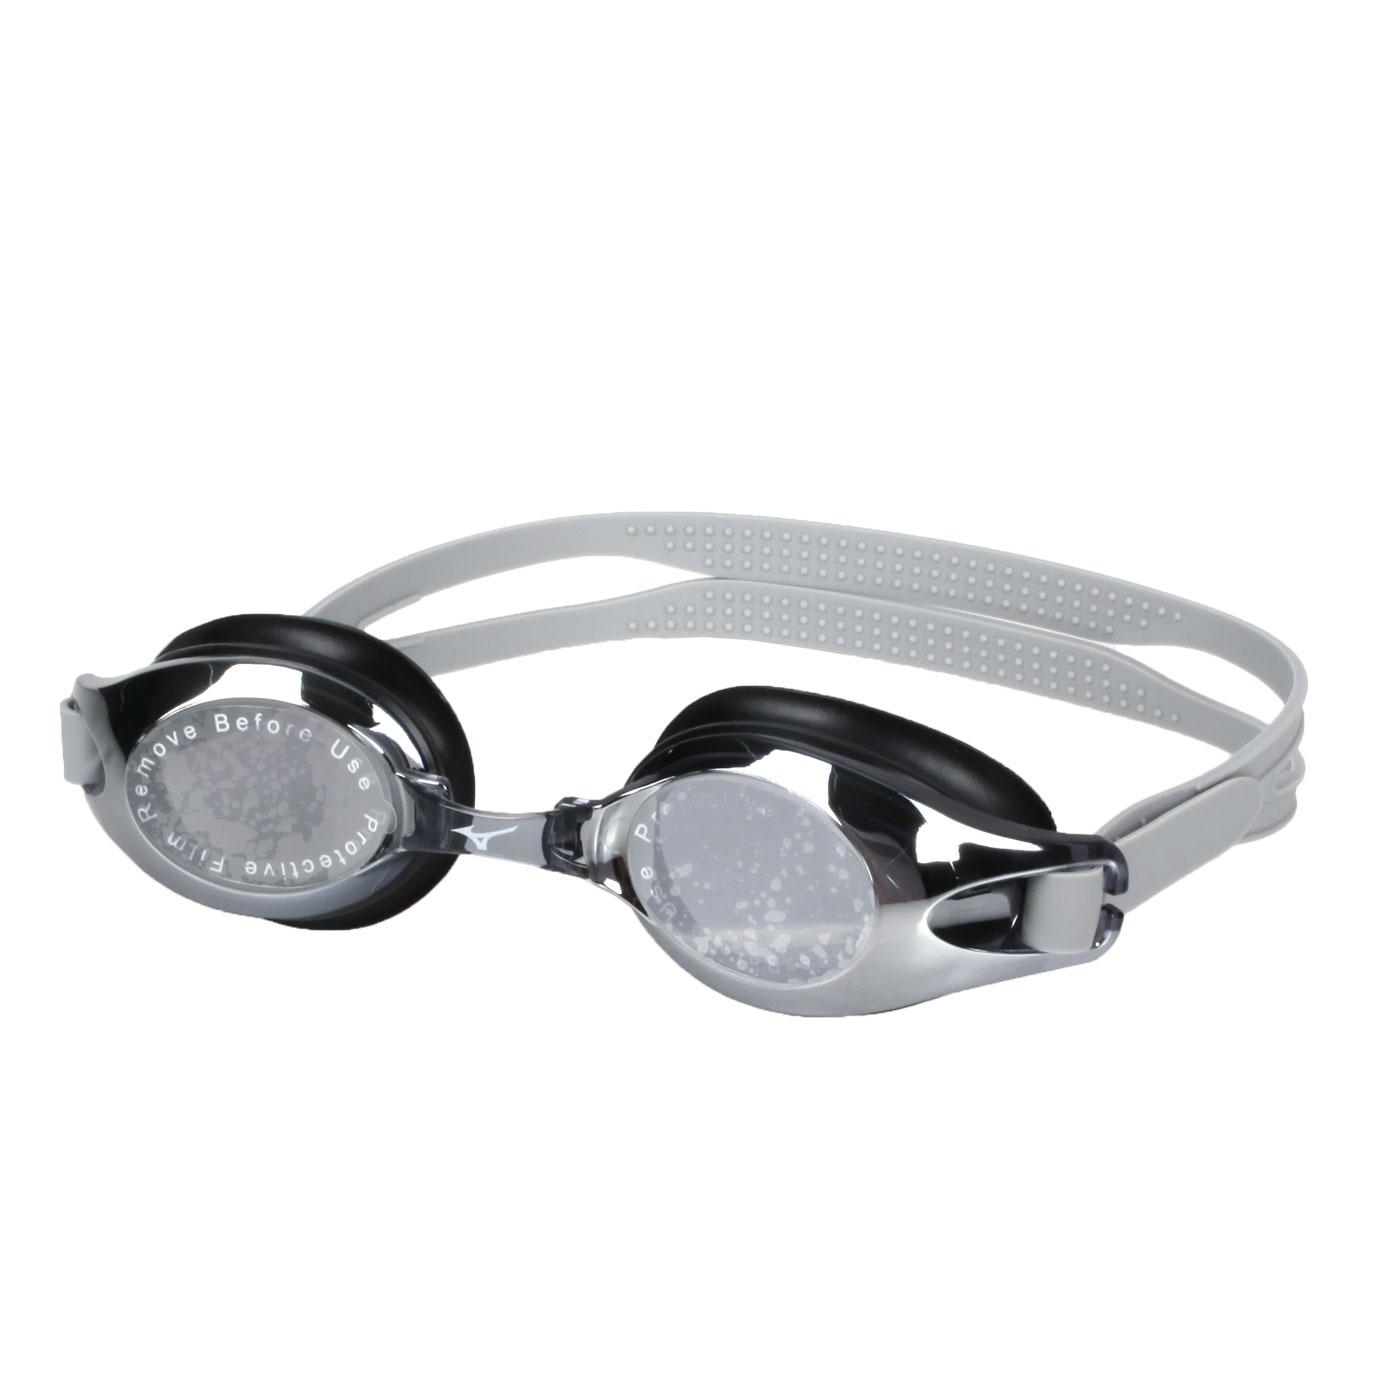 MIZUNO 泳鏡  SWIMN3TE702100-09 - 黑